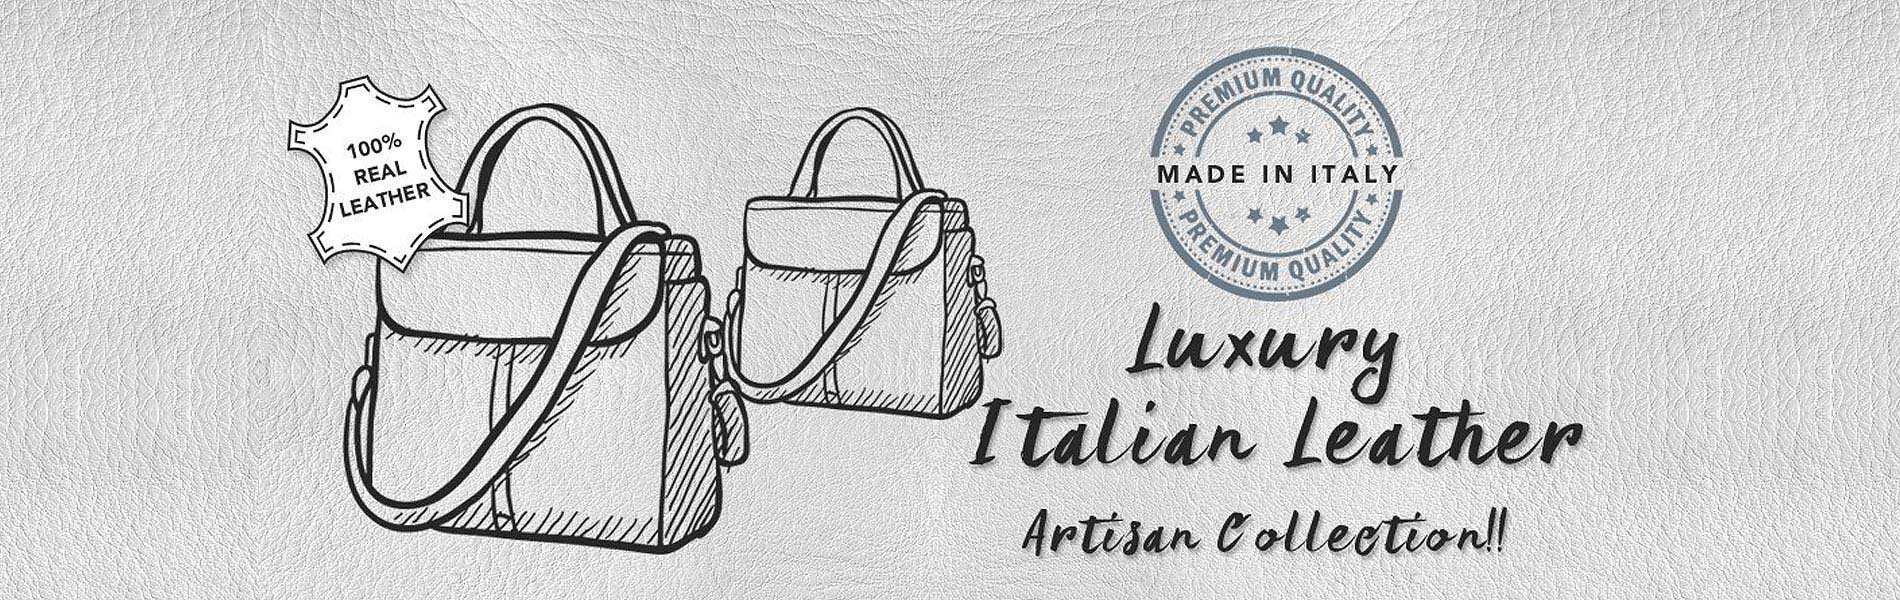 Luxury Italian Leather